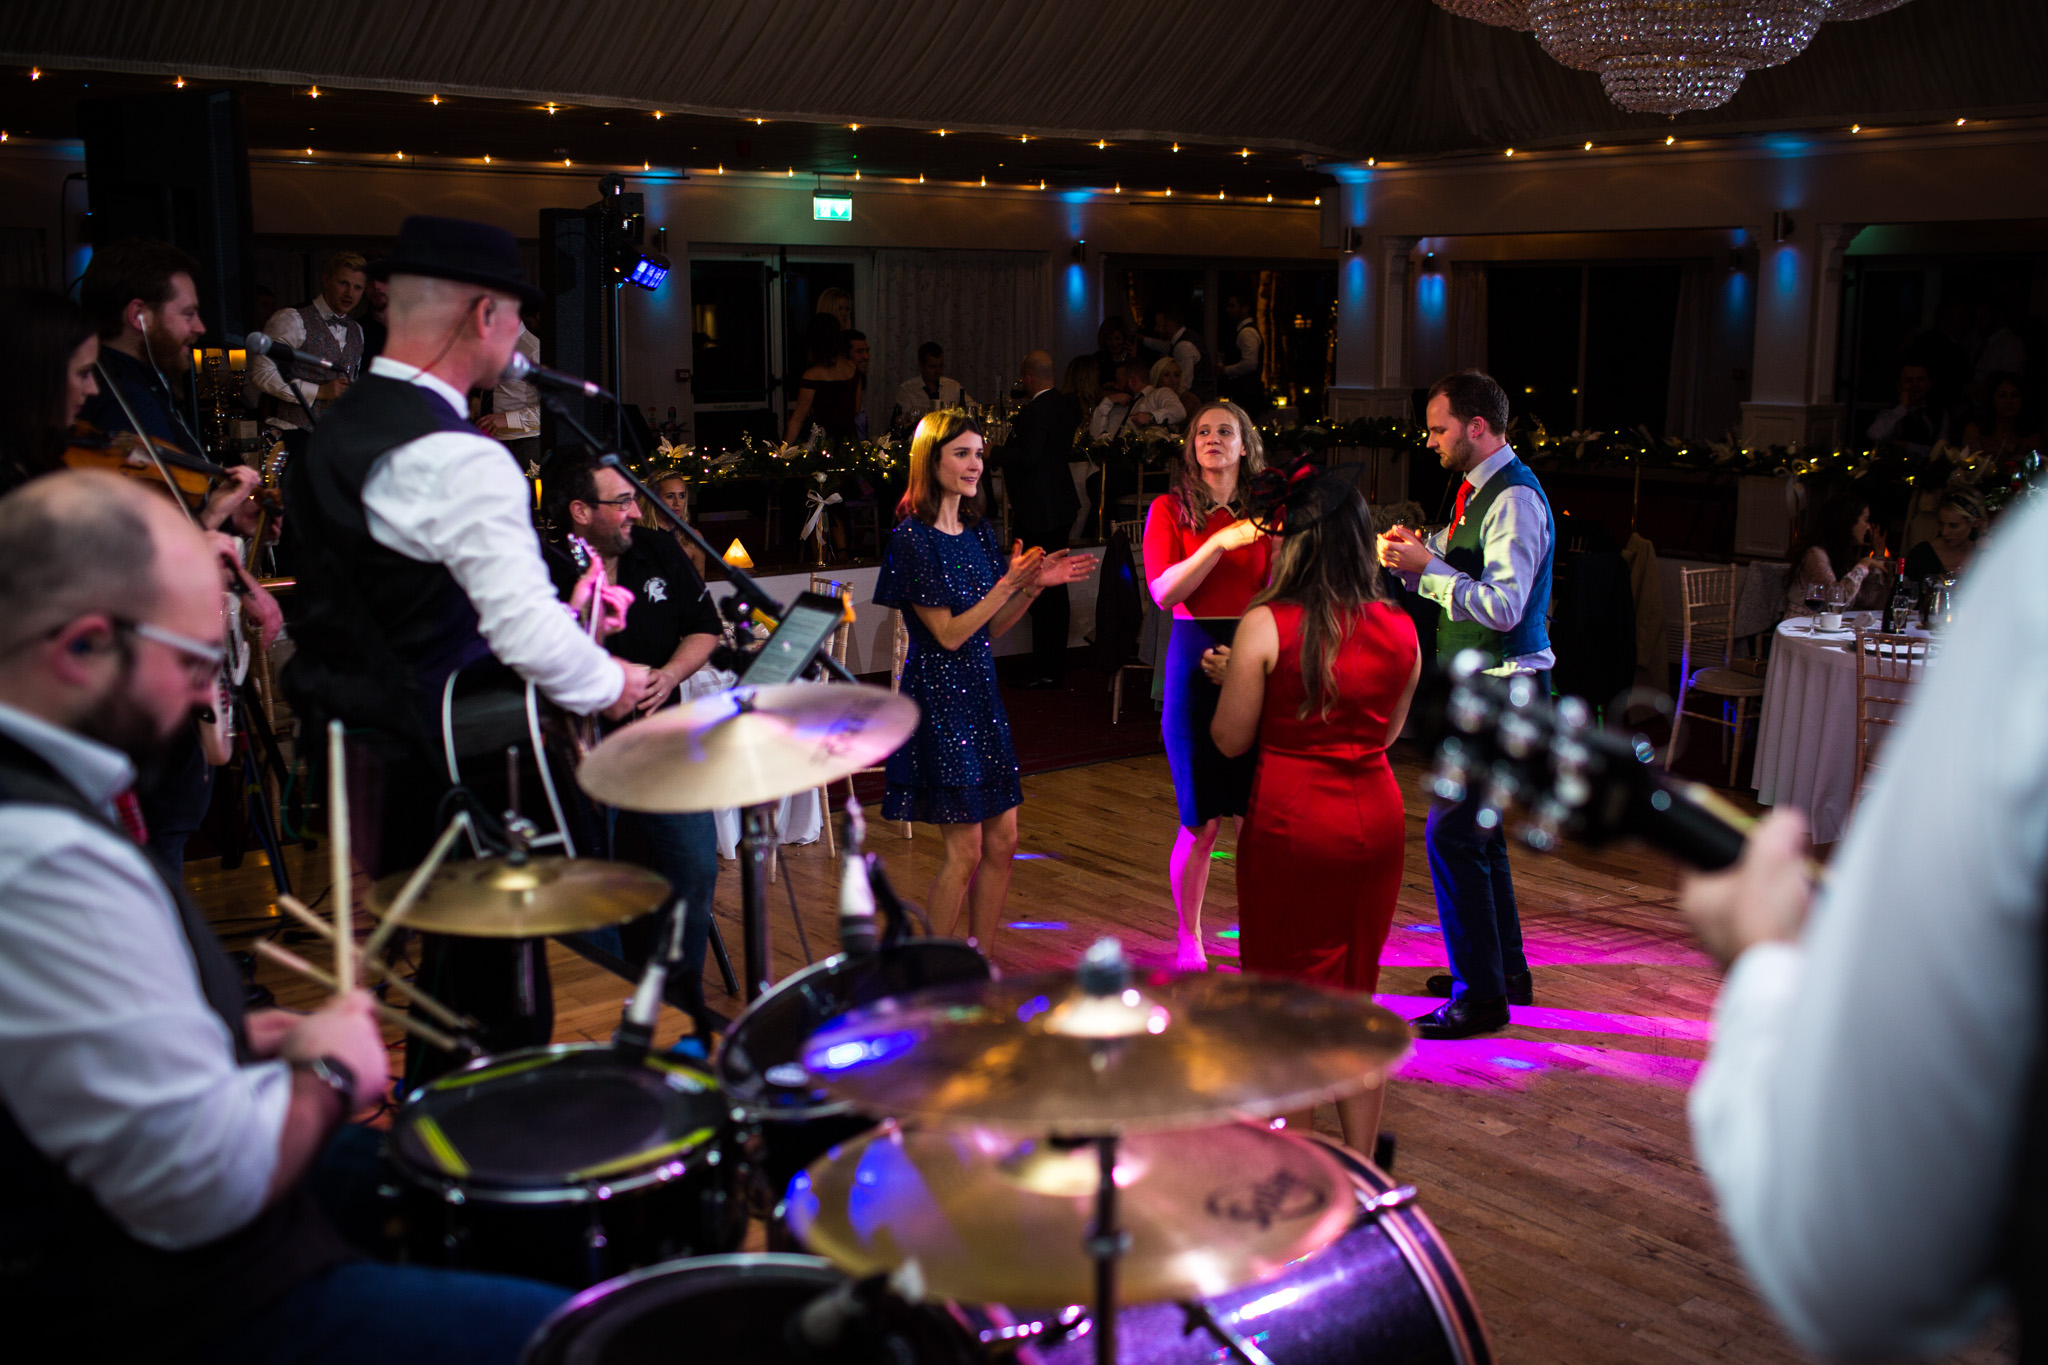 Mark_Barnes_Northern_Ireland_wedding_photographer_Harveys_Point_Donegall_Wedding_photography-Adam&Gemma-71.jpg